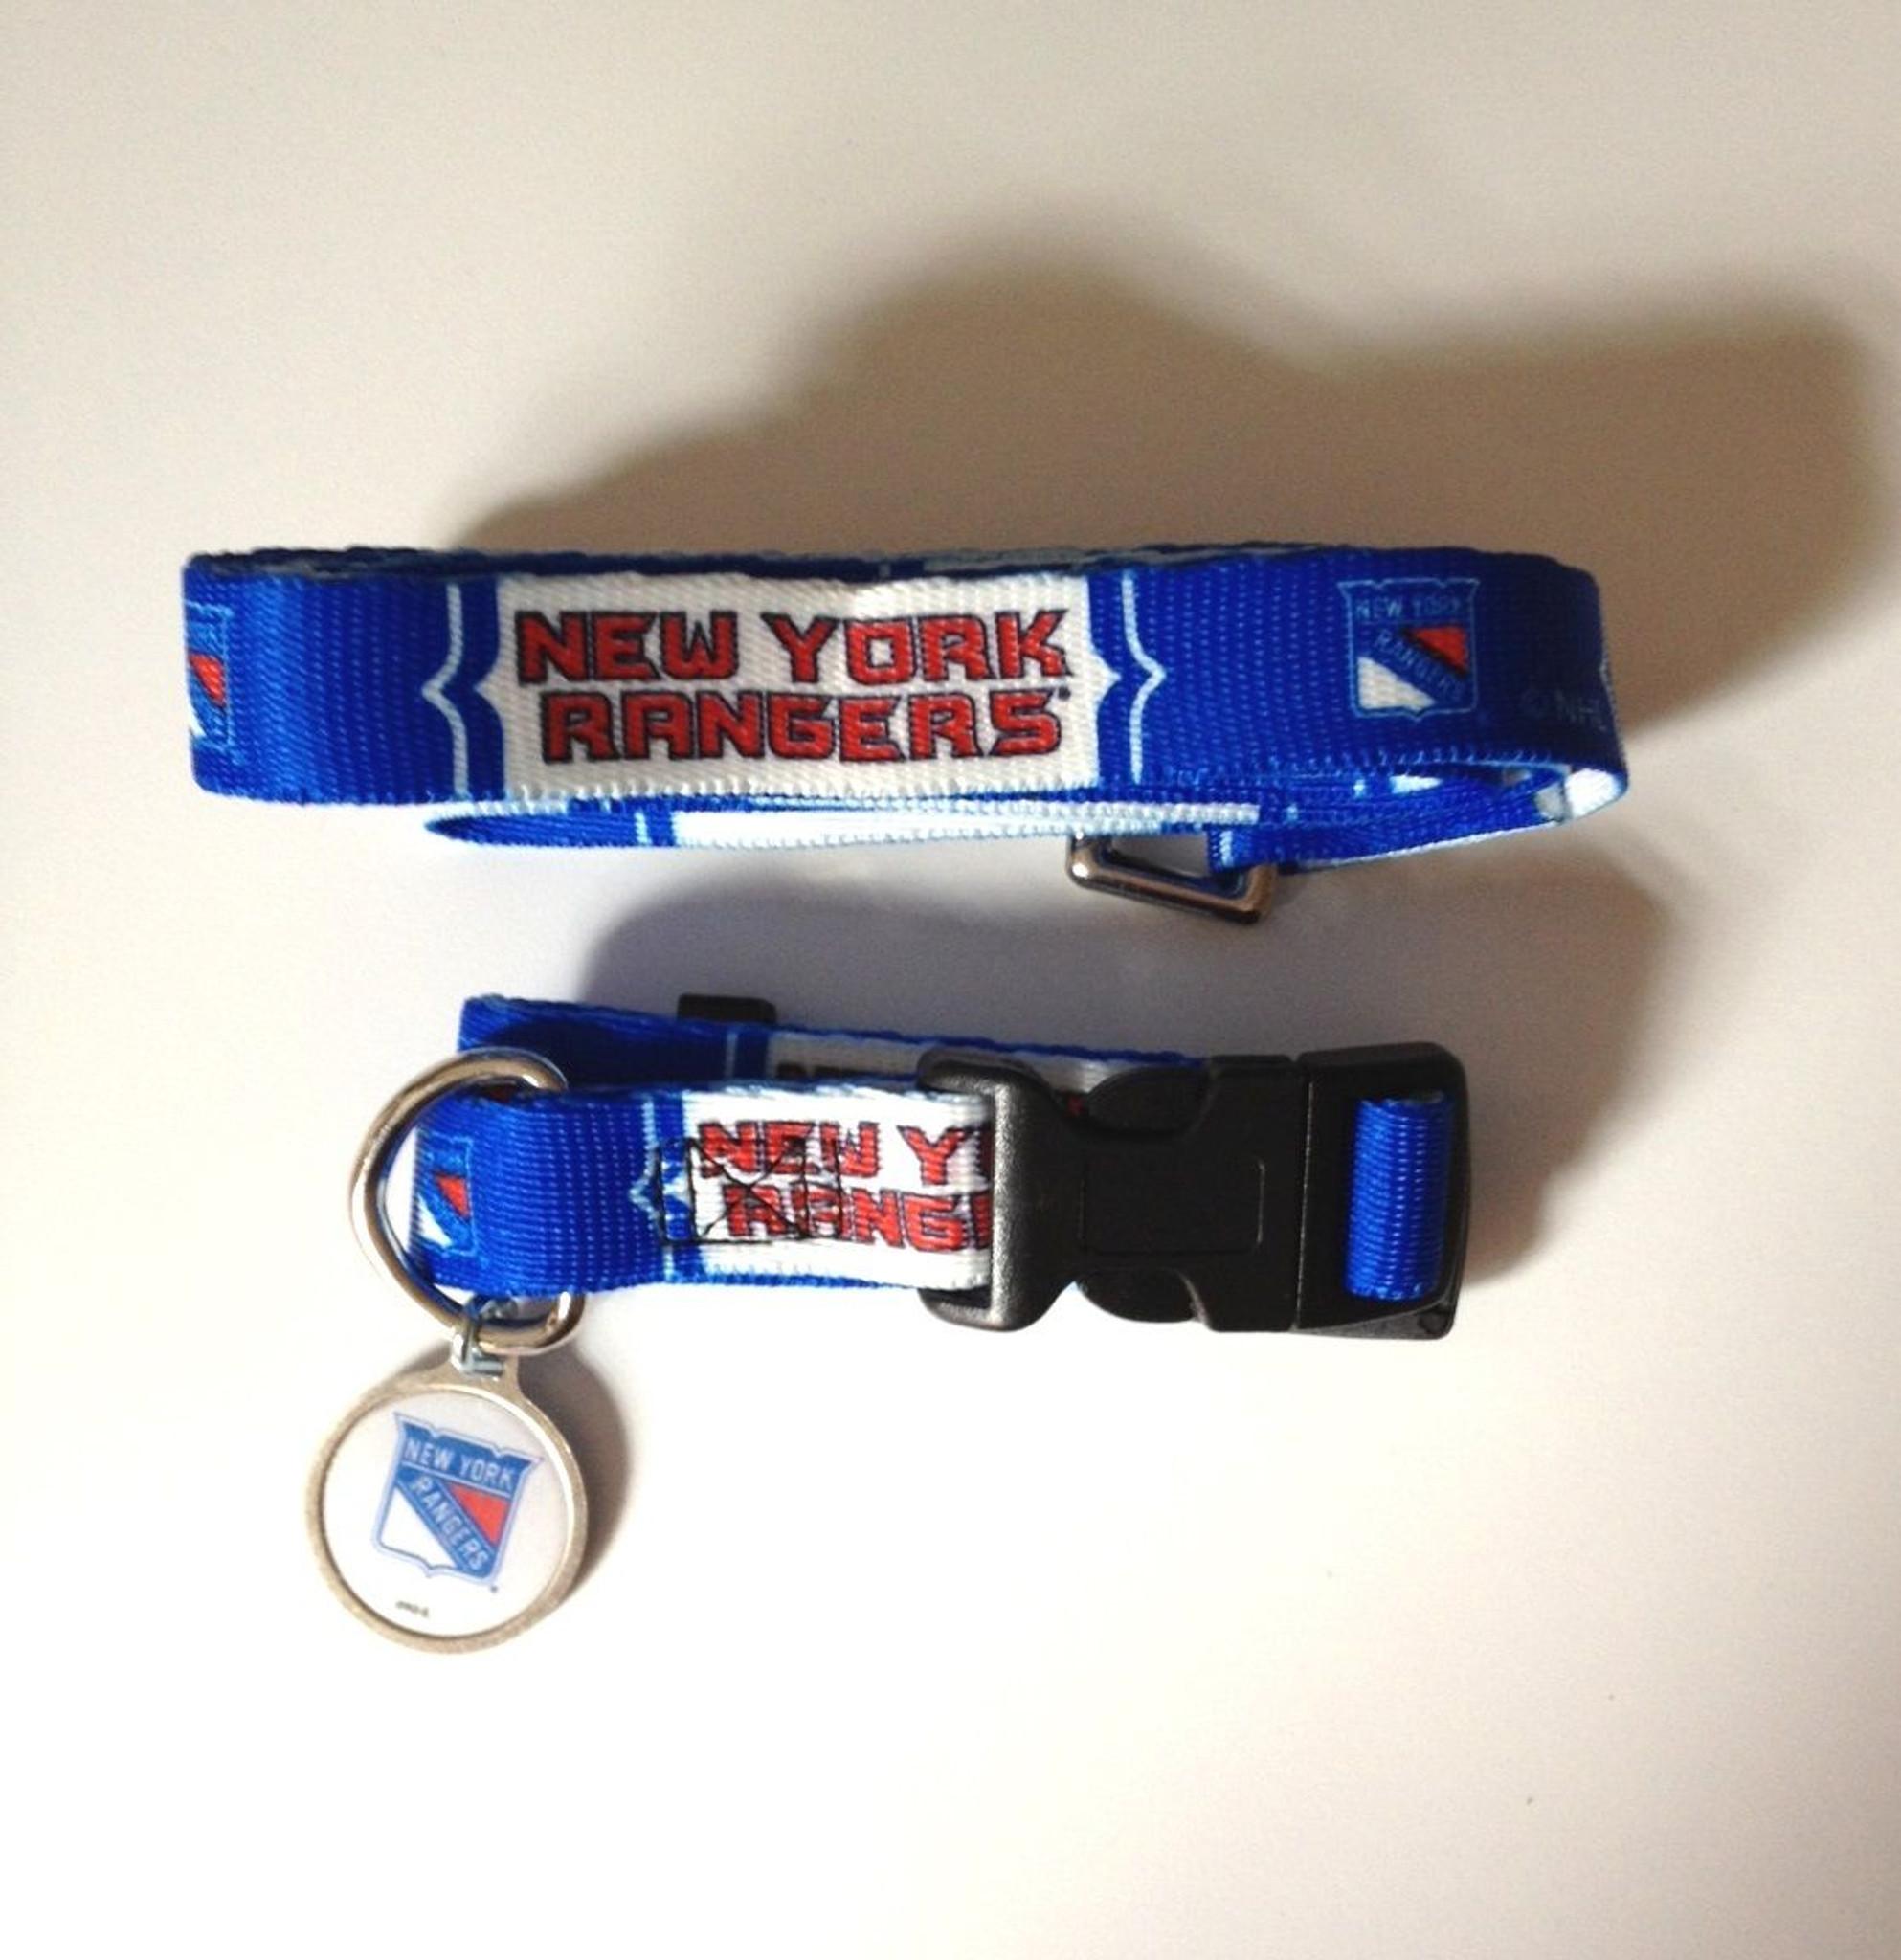 New York Rangers Dog 3pc Pet Set Leash Collar ID Tag - Spawty 13effea55